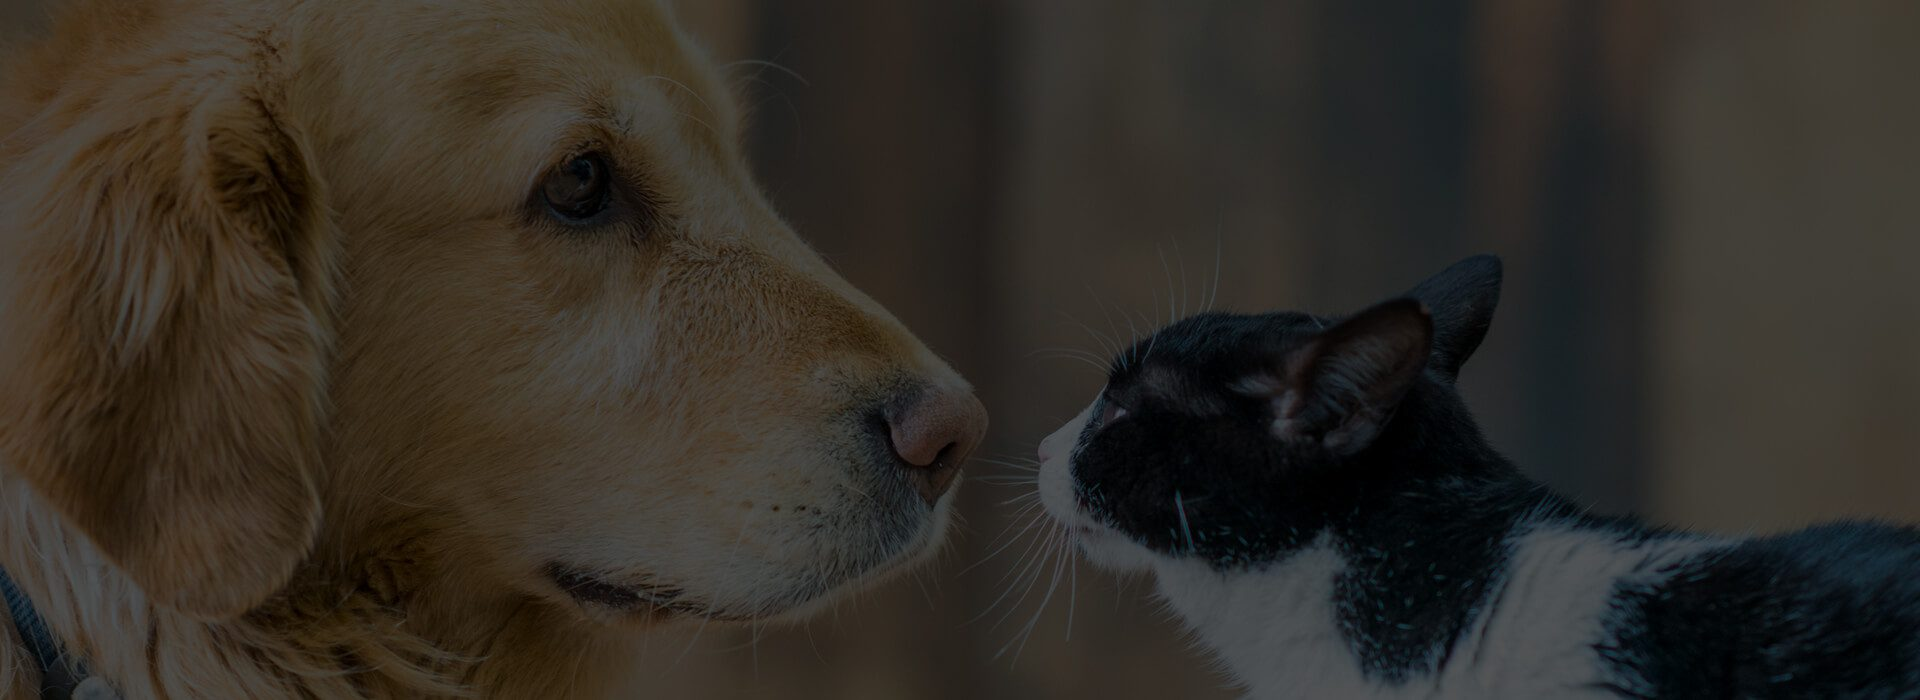 BluePearl Pet Hospital | Daly City, CA | 24/7 Emergency Pet